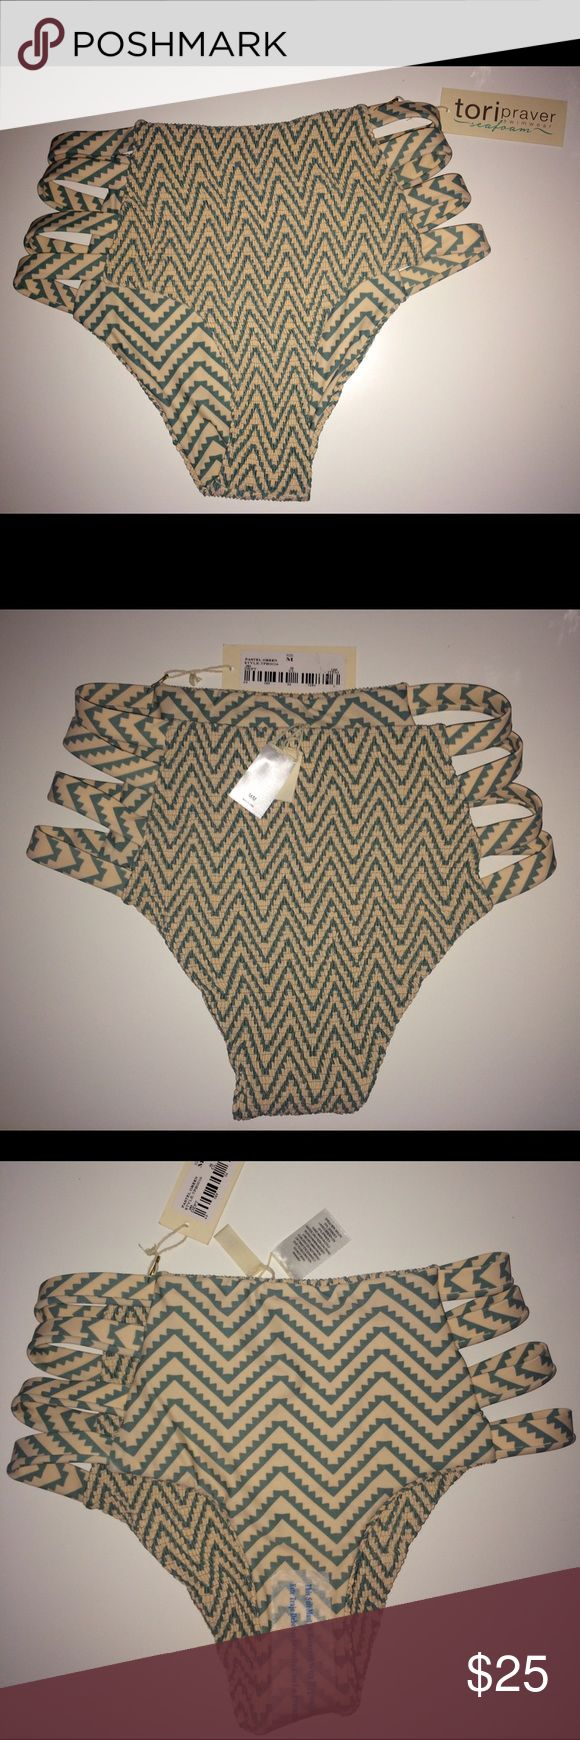 TORI PRAVER SEAFOAM HIGH WAIST BIKINI BOTTOM High-waisted bikini bottom by Tori Praver, part of Seafoam line. Size medium. Tori Praver Swimwear Swim Bikinis